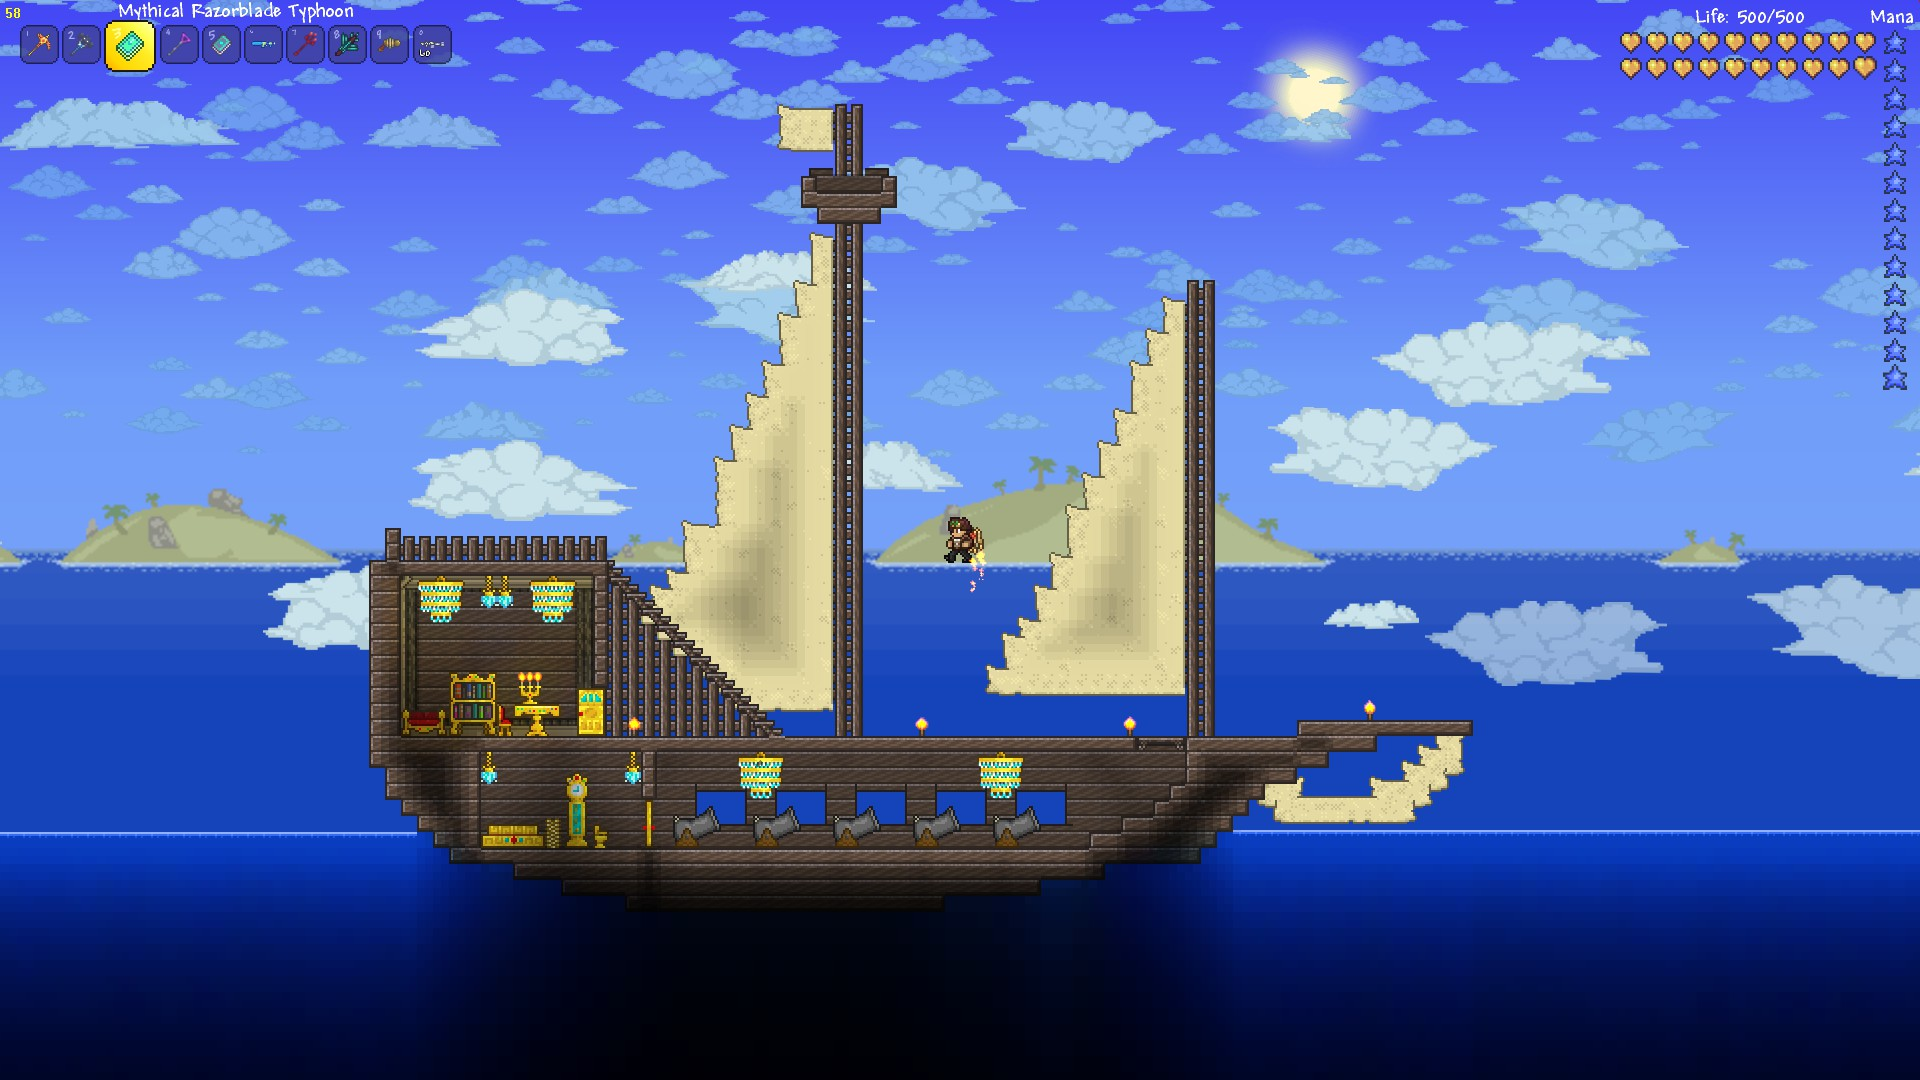 Wood Lego House Terraria Pirate Ship By Noobiemcnoob On Deviantart